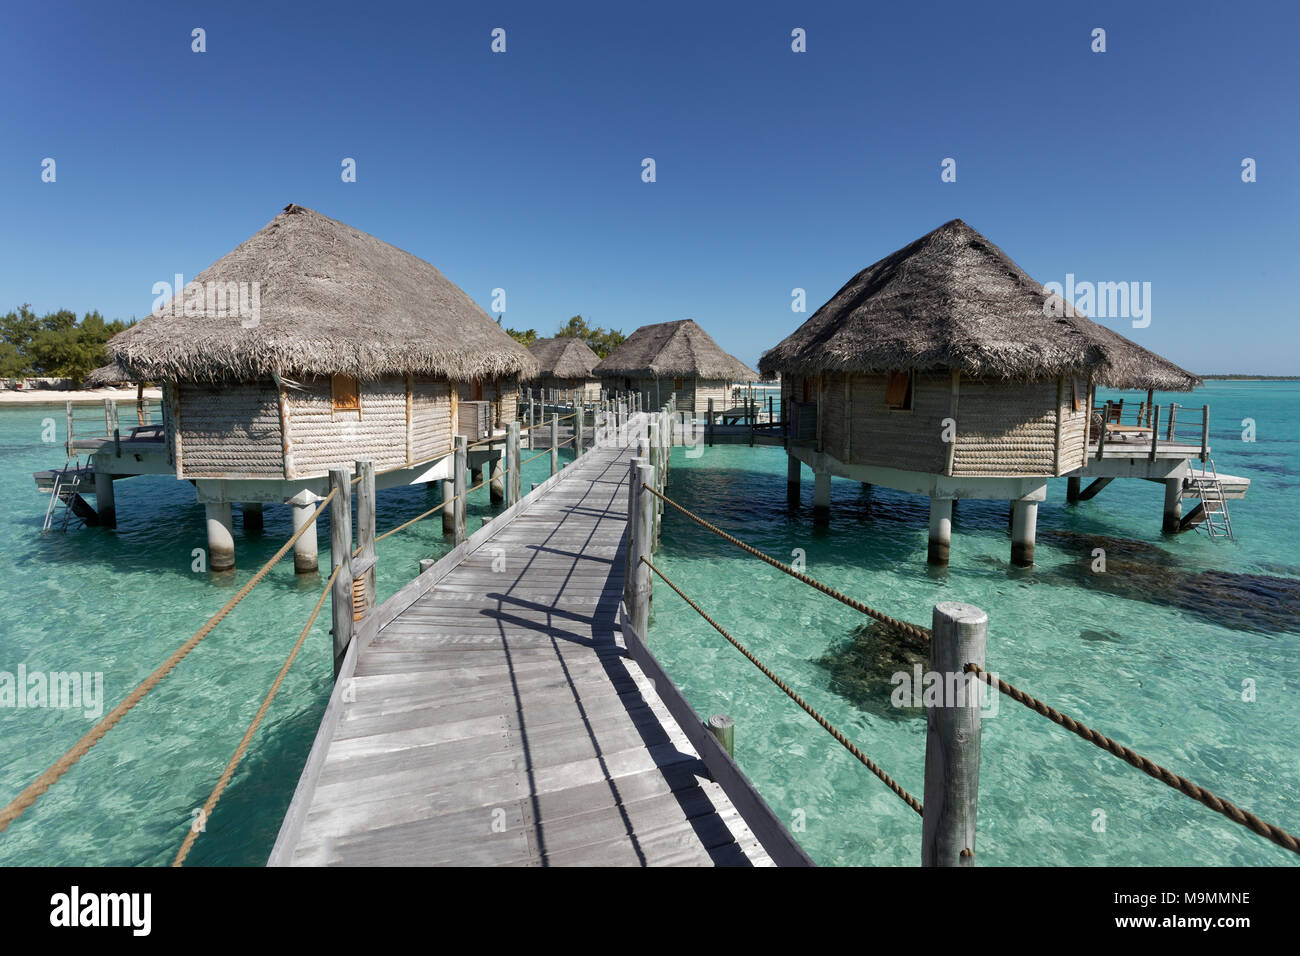 Bungalows, bungalows de agua en el muelle de laguna, Tikehau Pearl Beach Resort, Tikehau Atolón Archipiélago Tuamotu Imagen De Stock